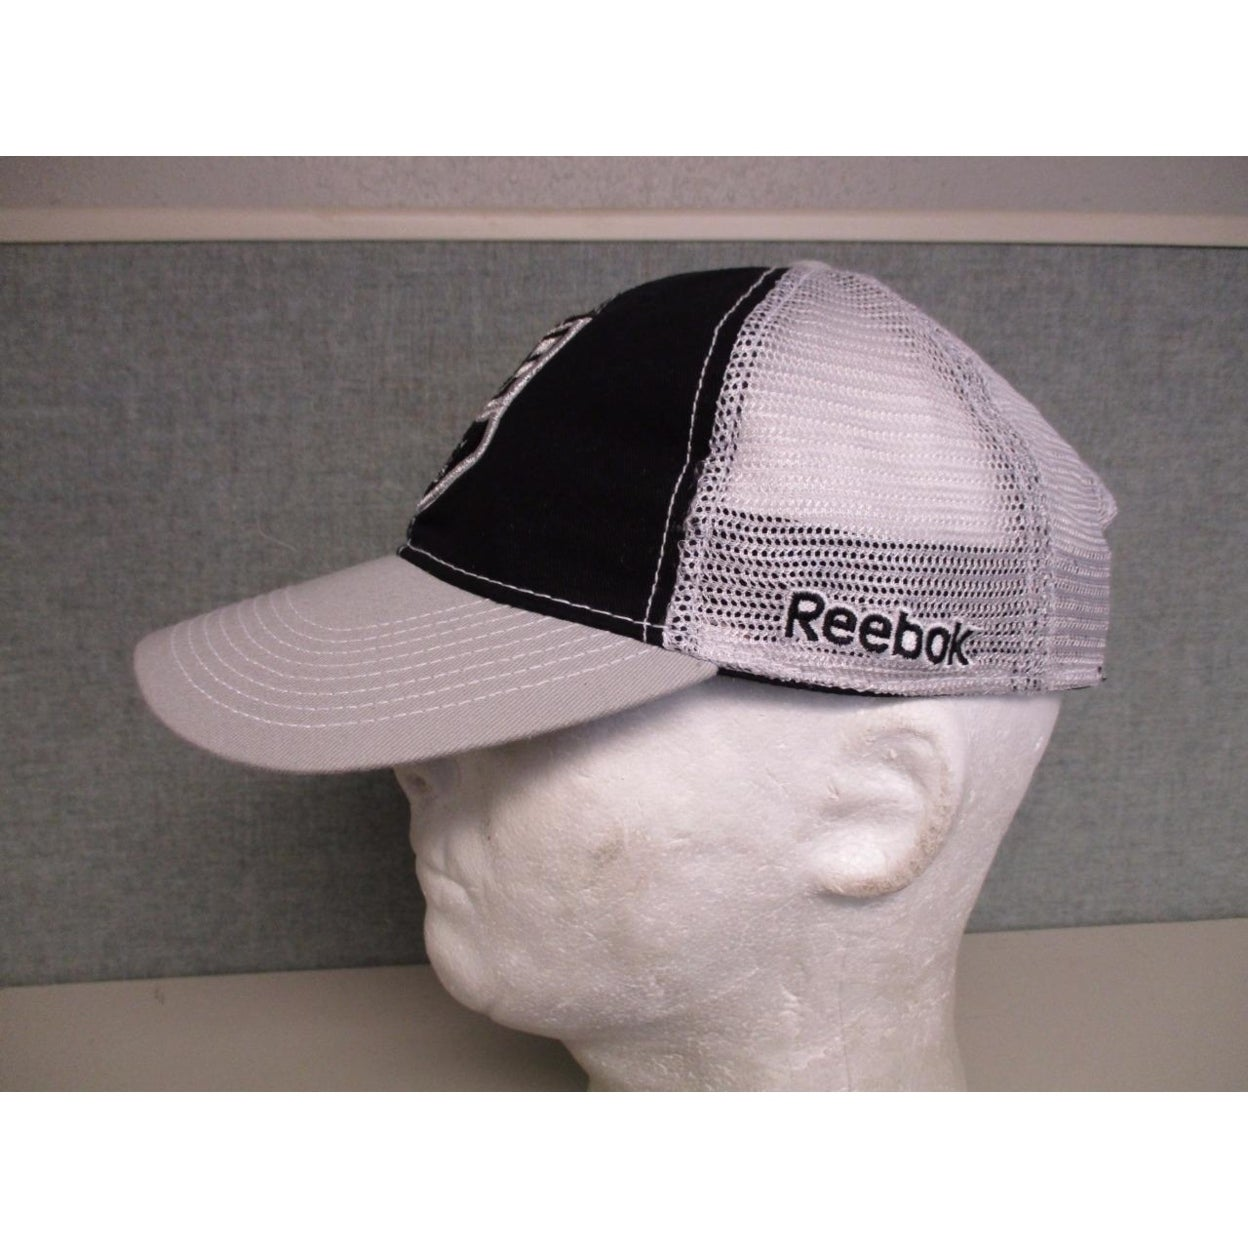 wholesale dealer 5ca23 cb643 Shop Los Angeles La Kings Mens Adult Osfa Reebok Trucker Snapback Hat  20 -  On Sale - Free Shipping On Orders Over  45 - Overstock - 23070732